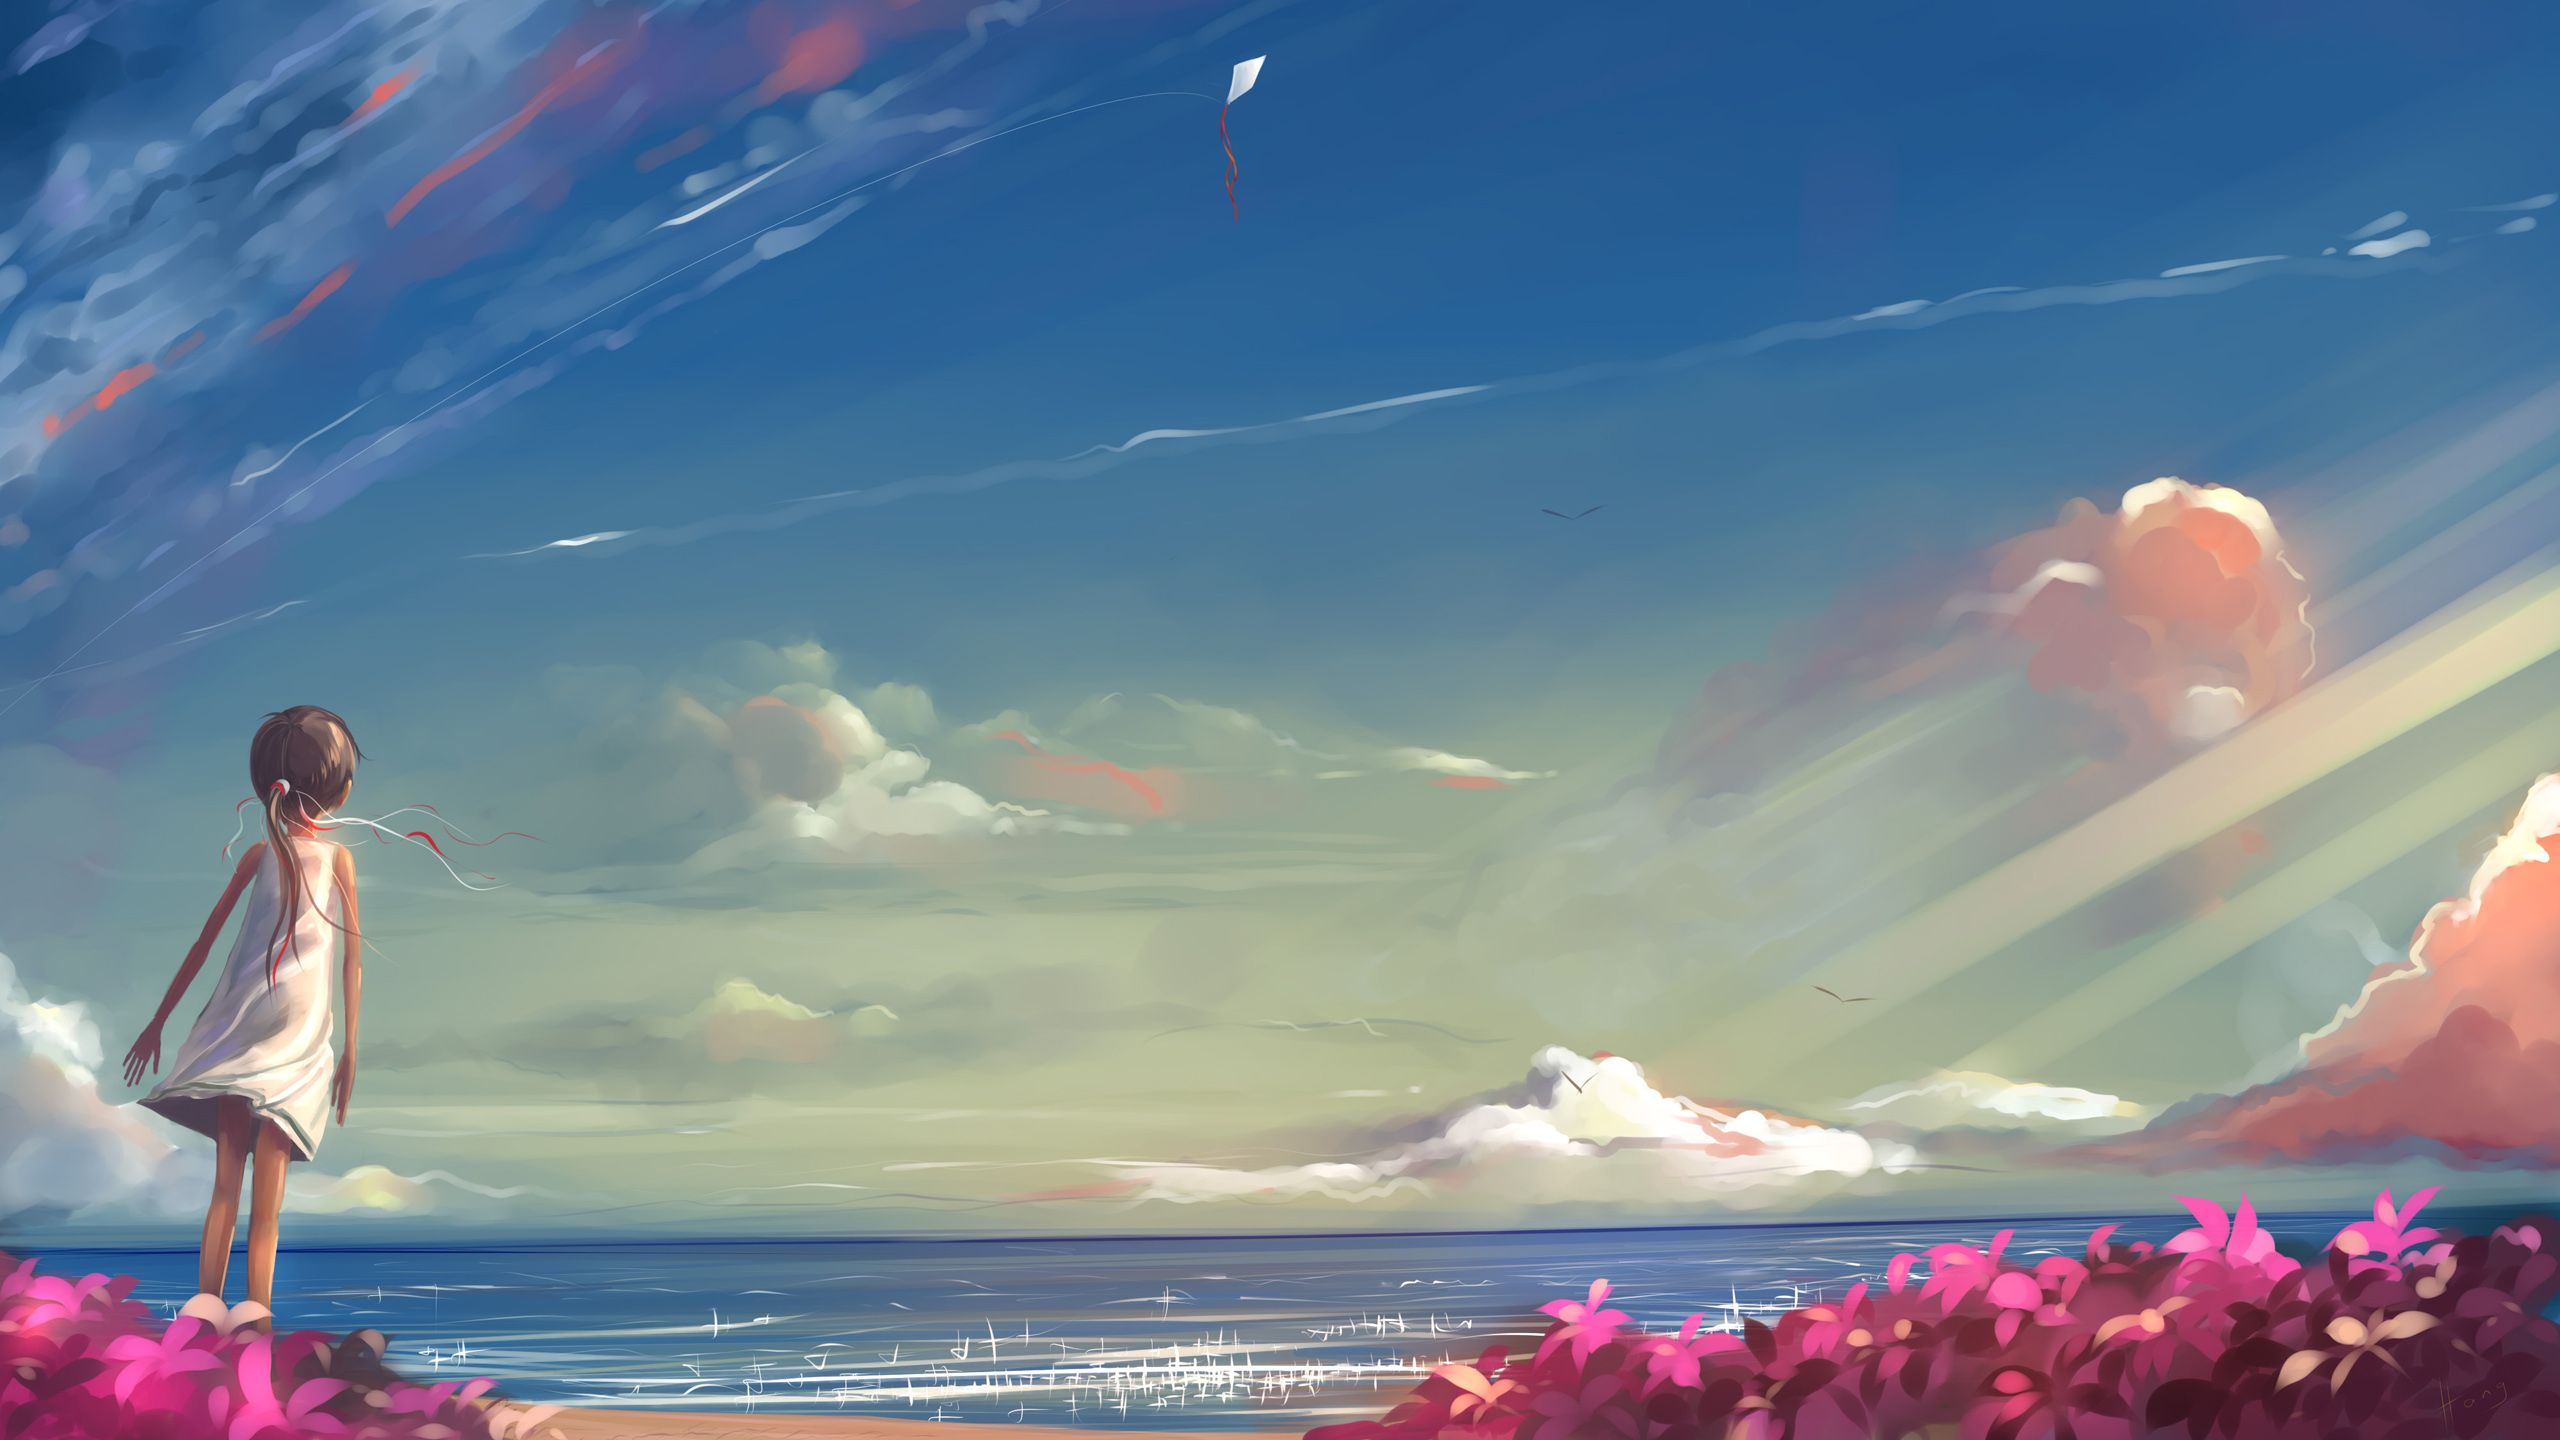 Girl Looking At Sky Kite Ocean Beach Child Original Sky